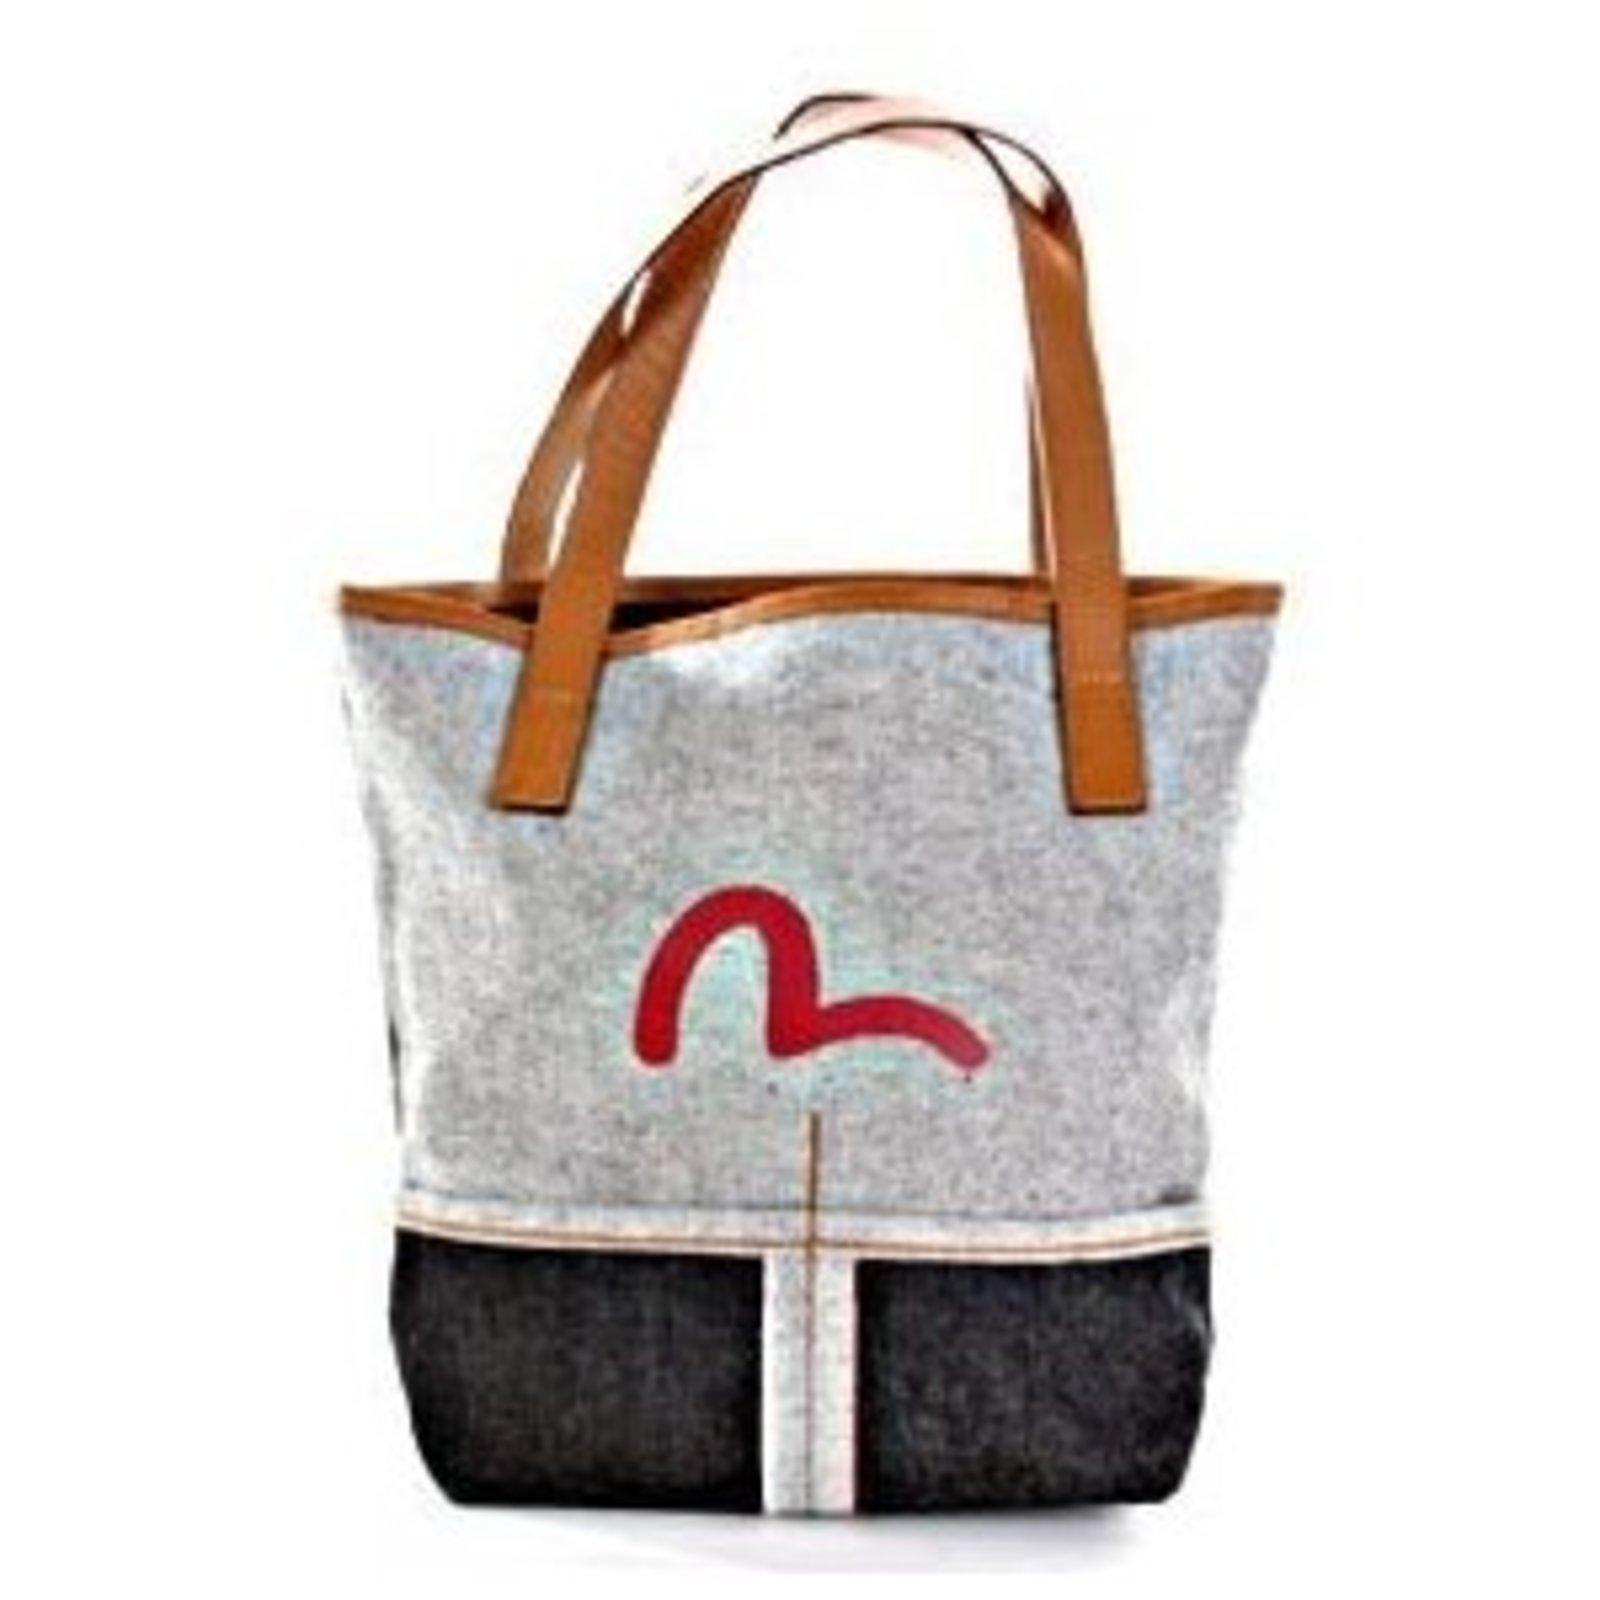 Superb Denim Shopper Bag for Women from Evisu at Togged